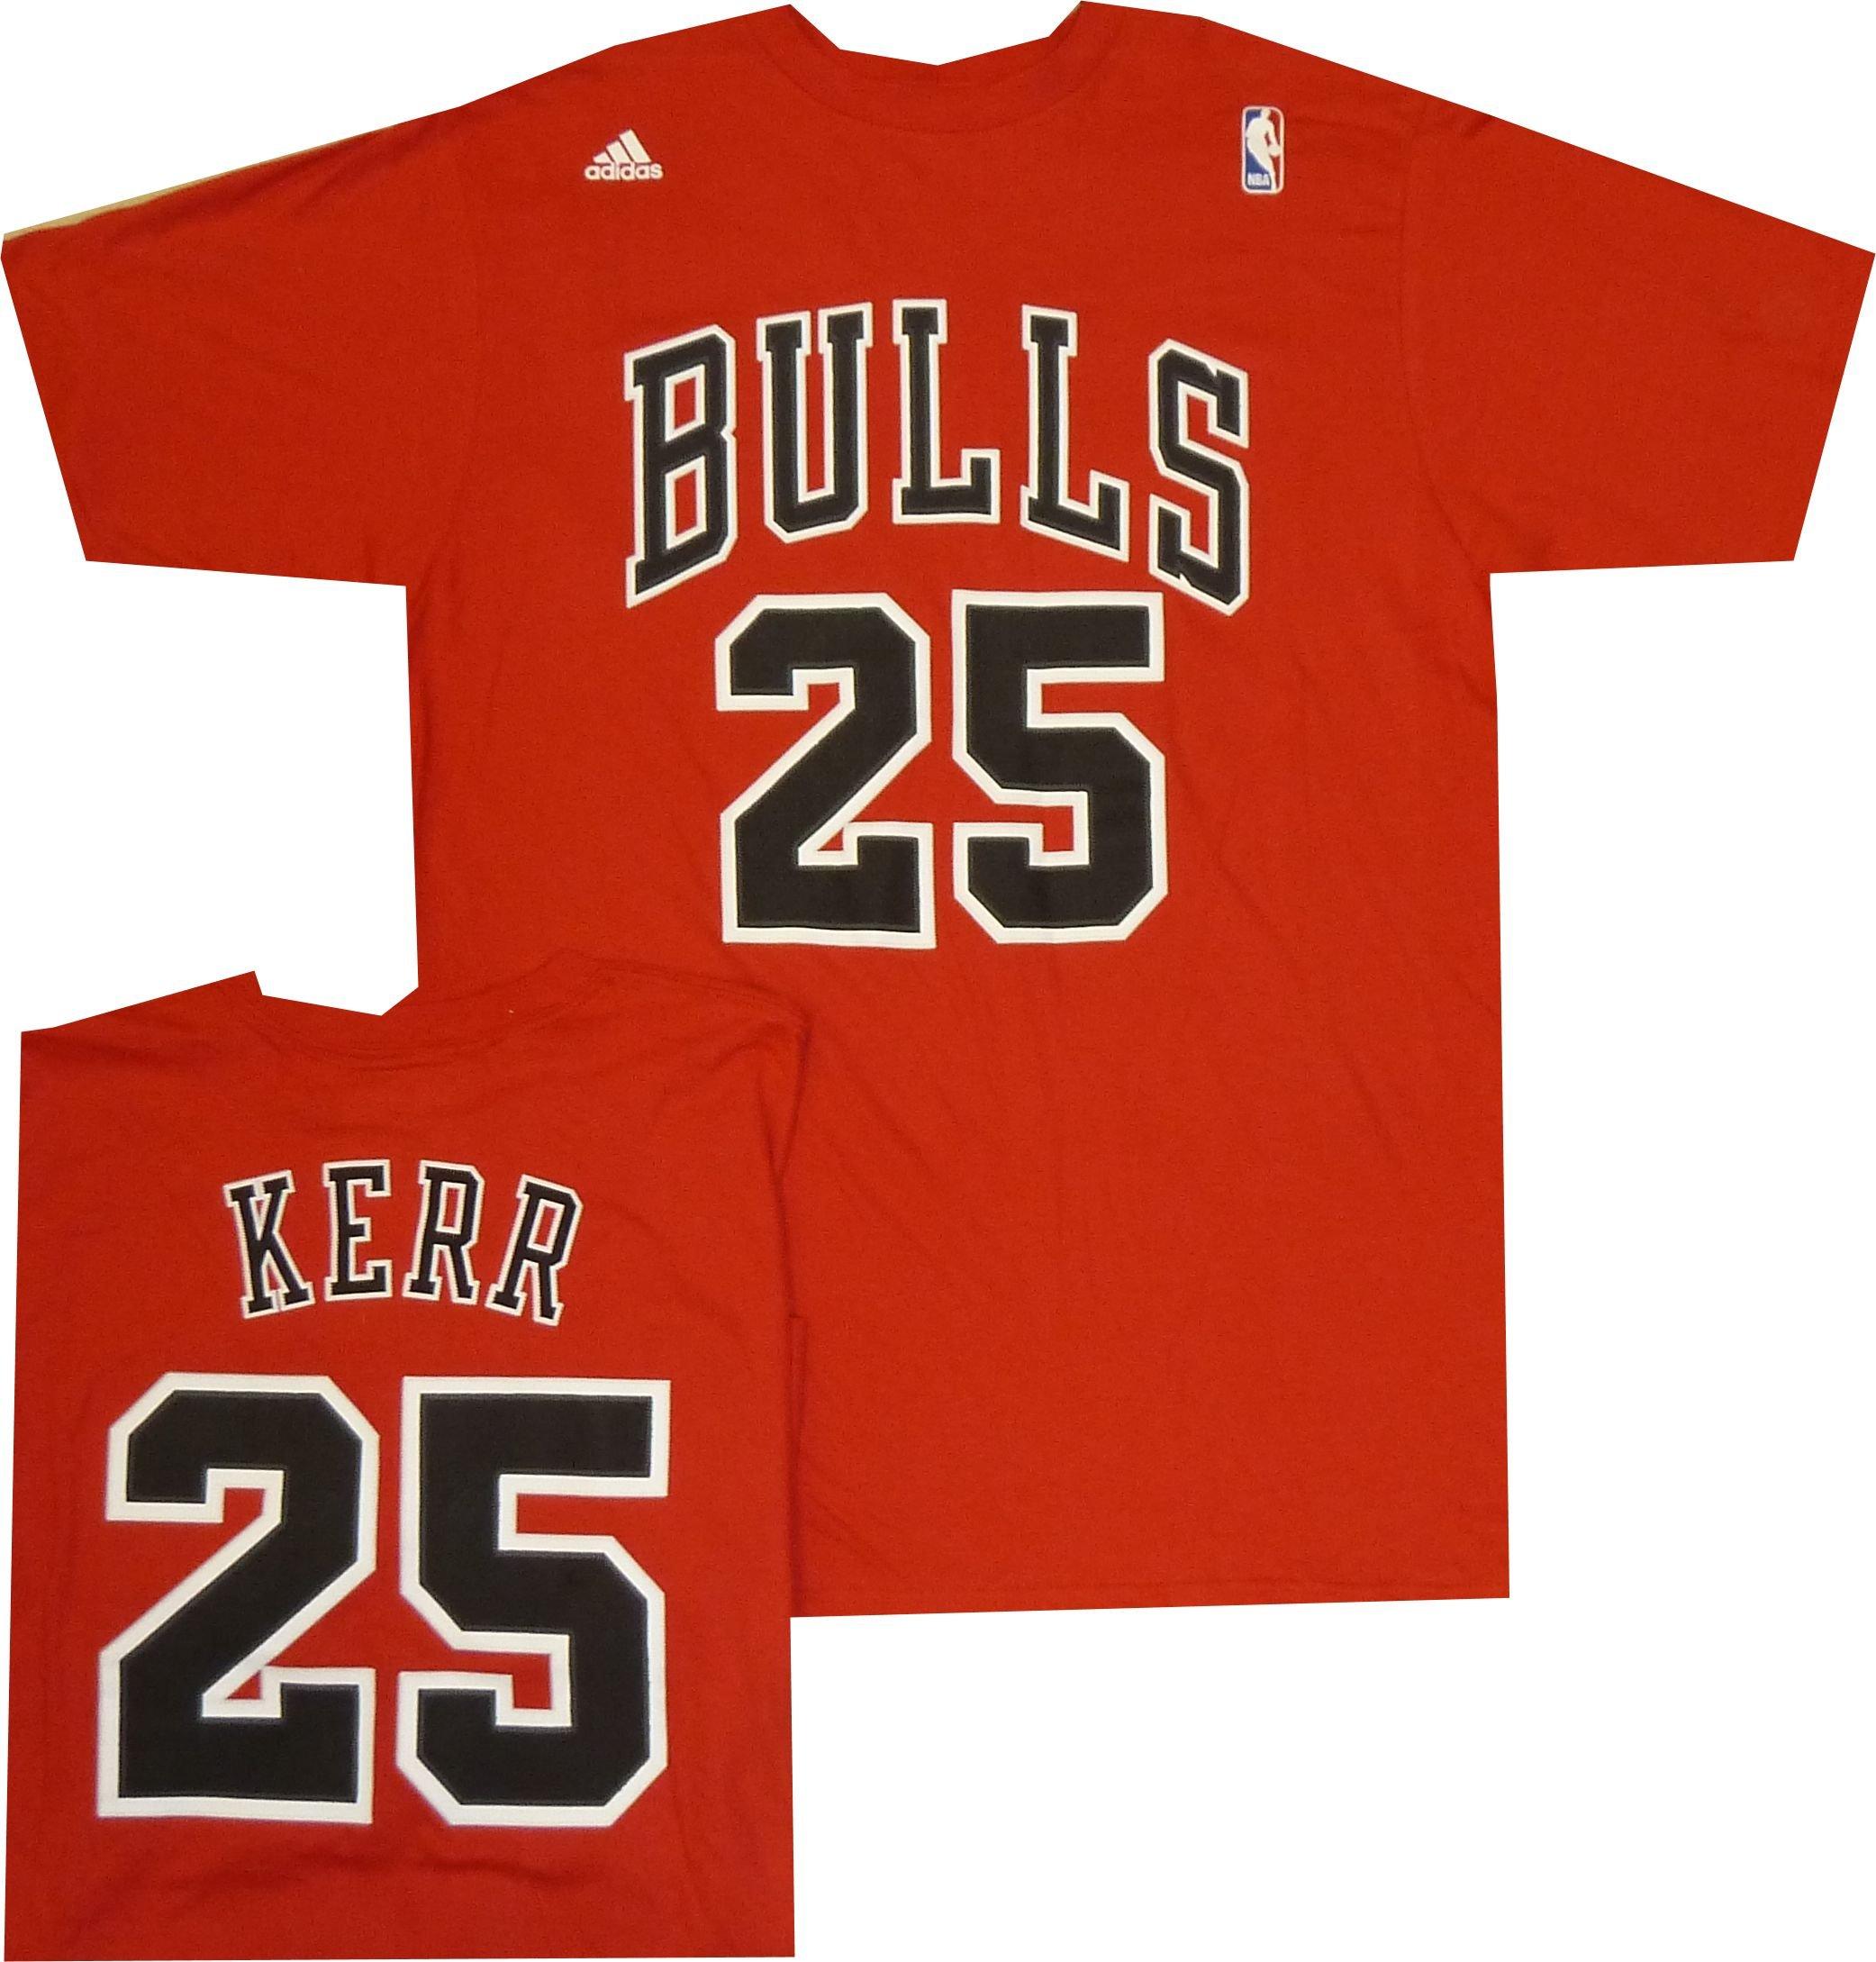 sale retailer bc0af 88d2d Galleon - Adidas Men's Chicago Bulls Steve Kerr Throwback ...